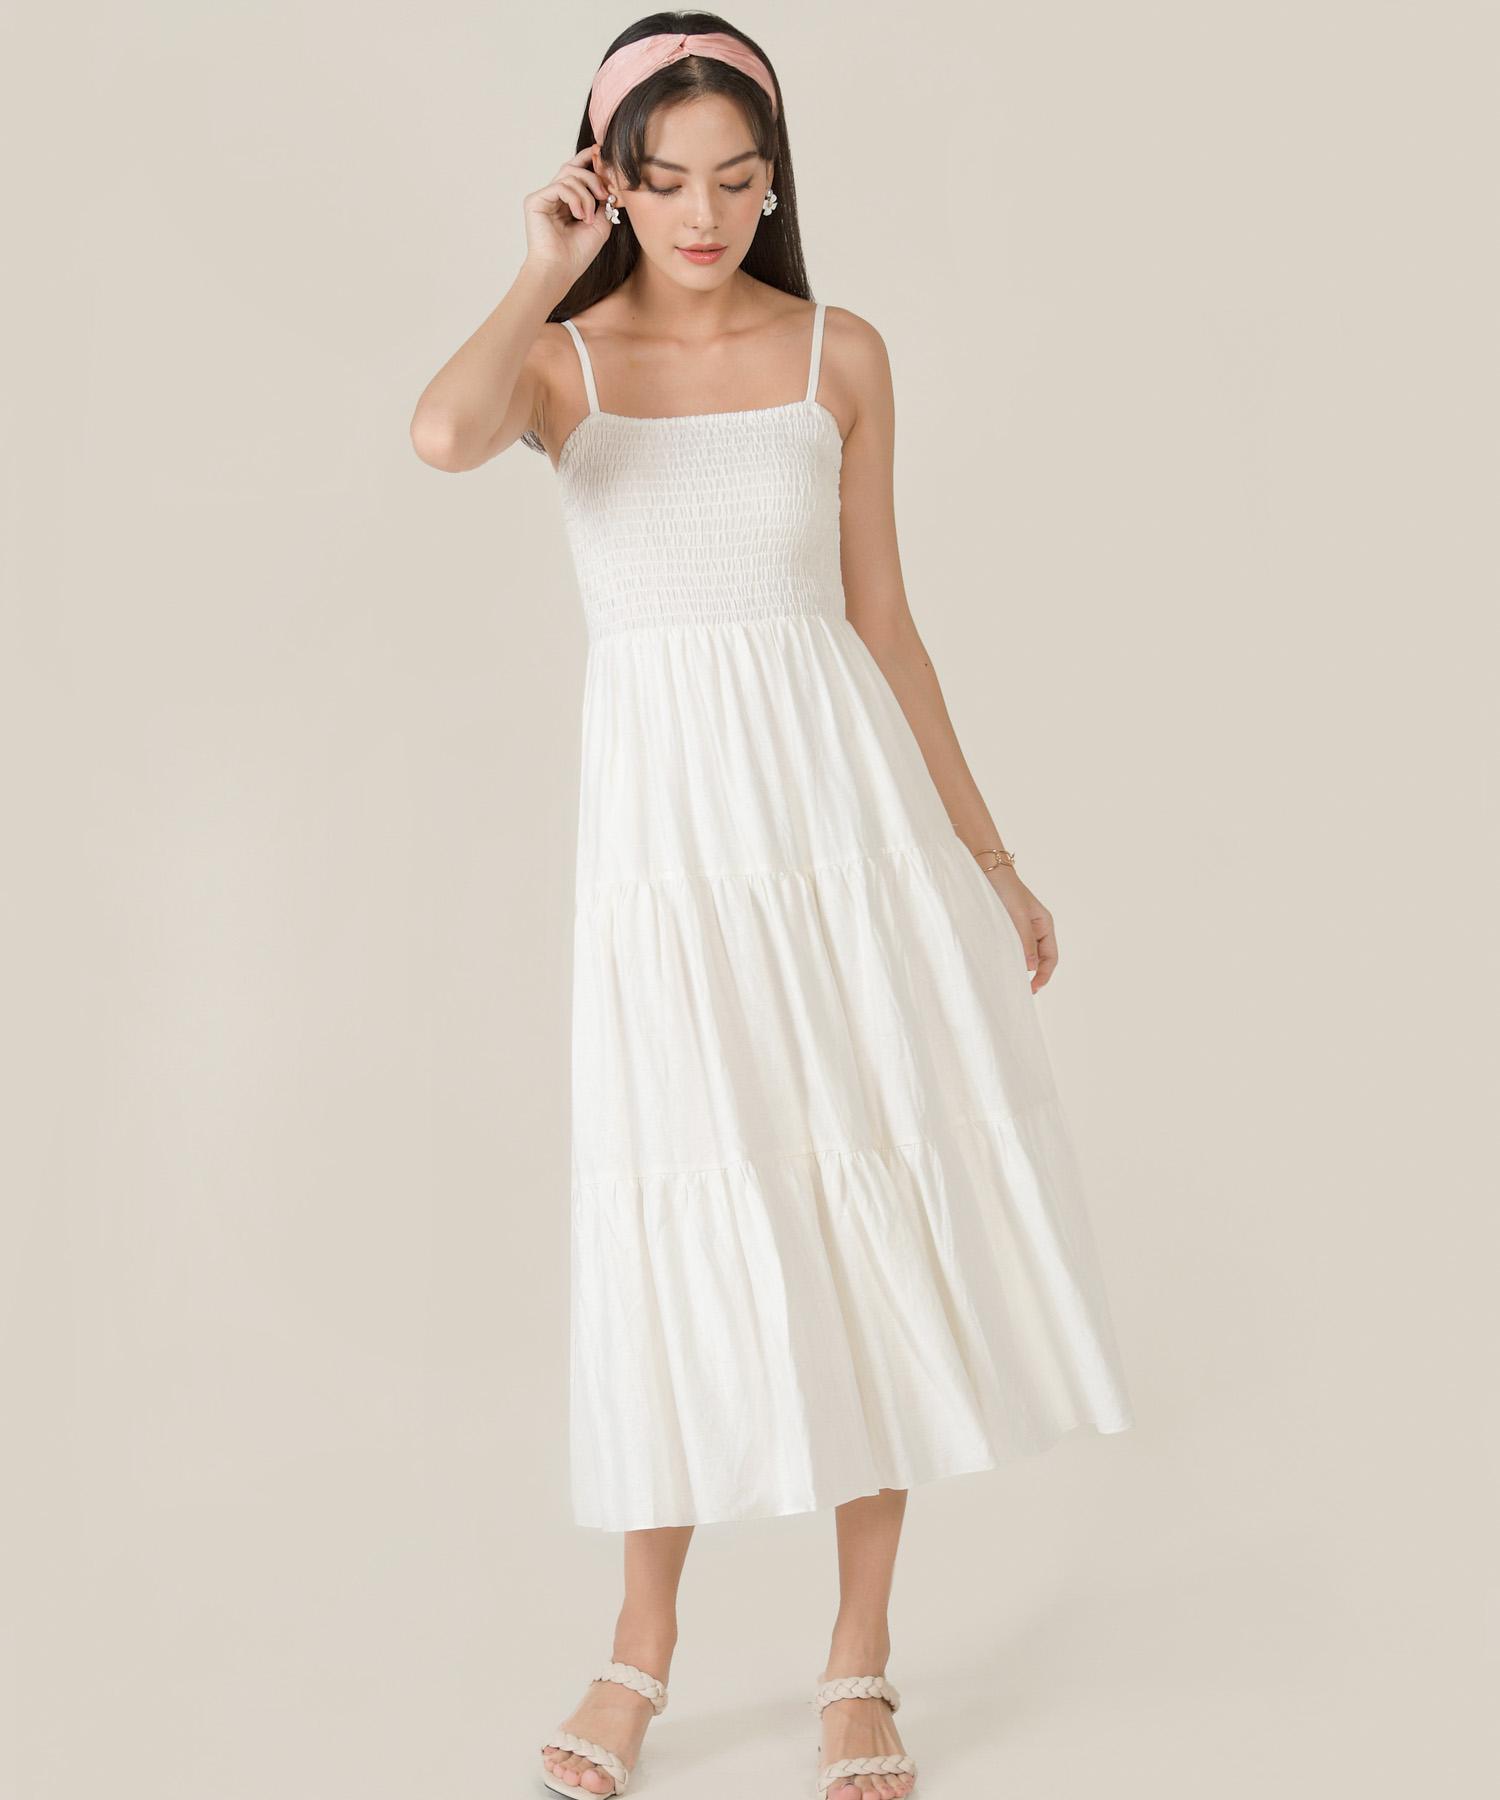 lalique-smocked-maxi-dress-white-4